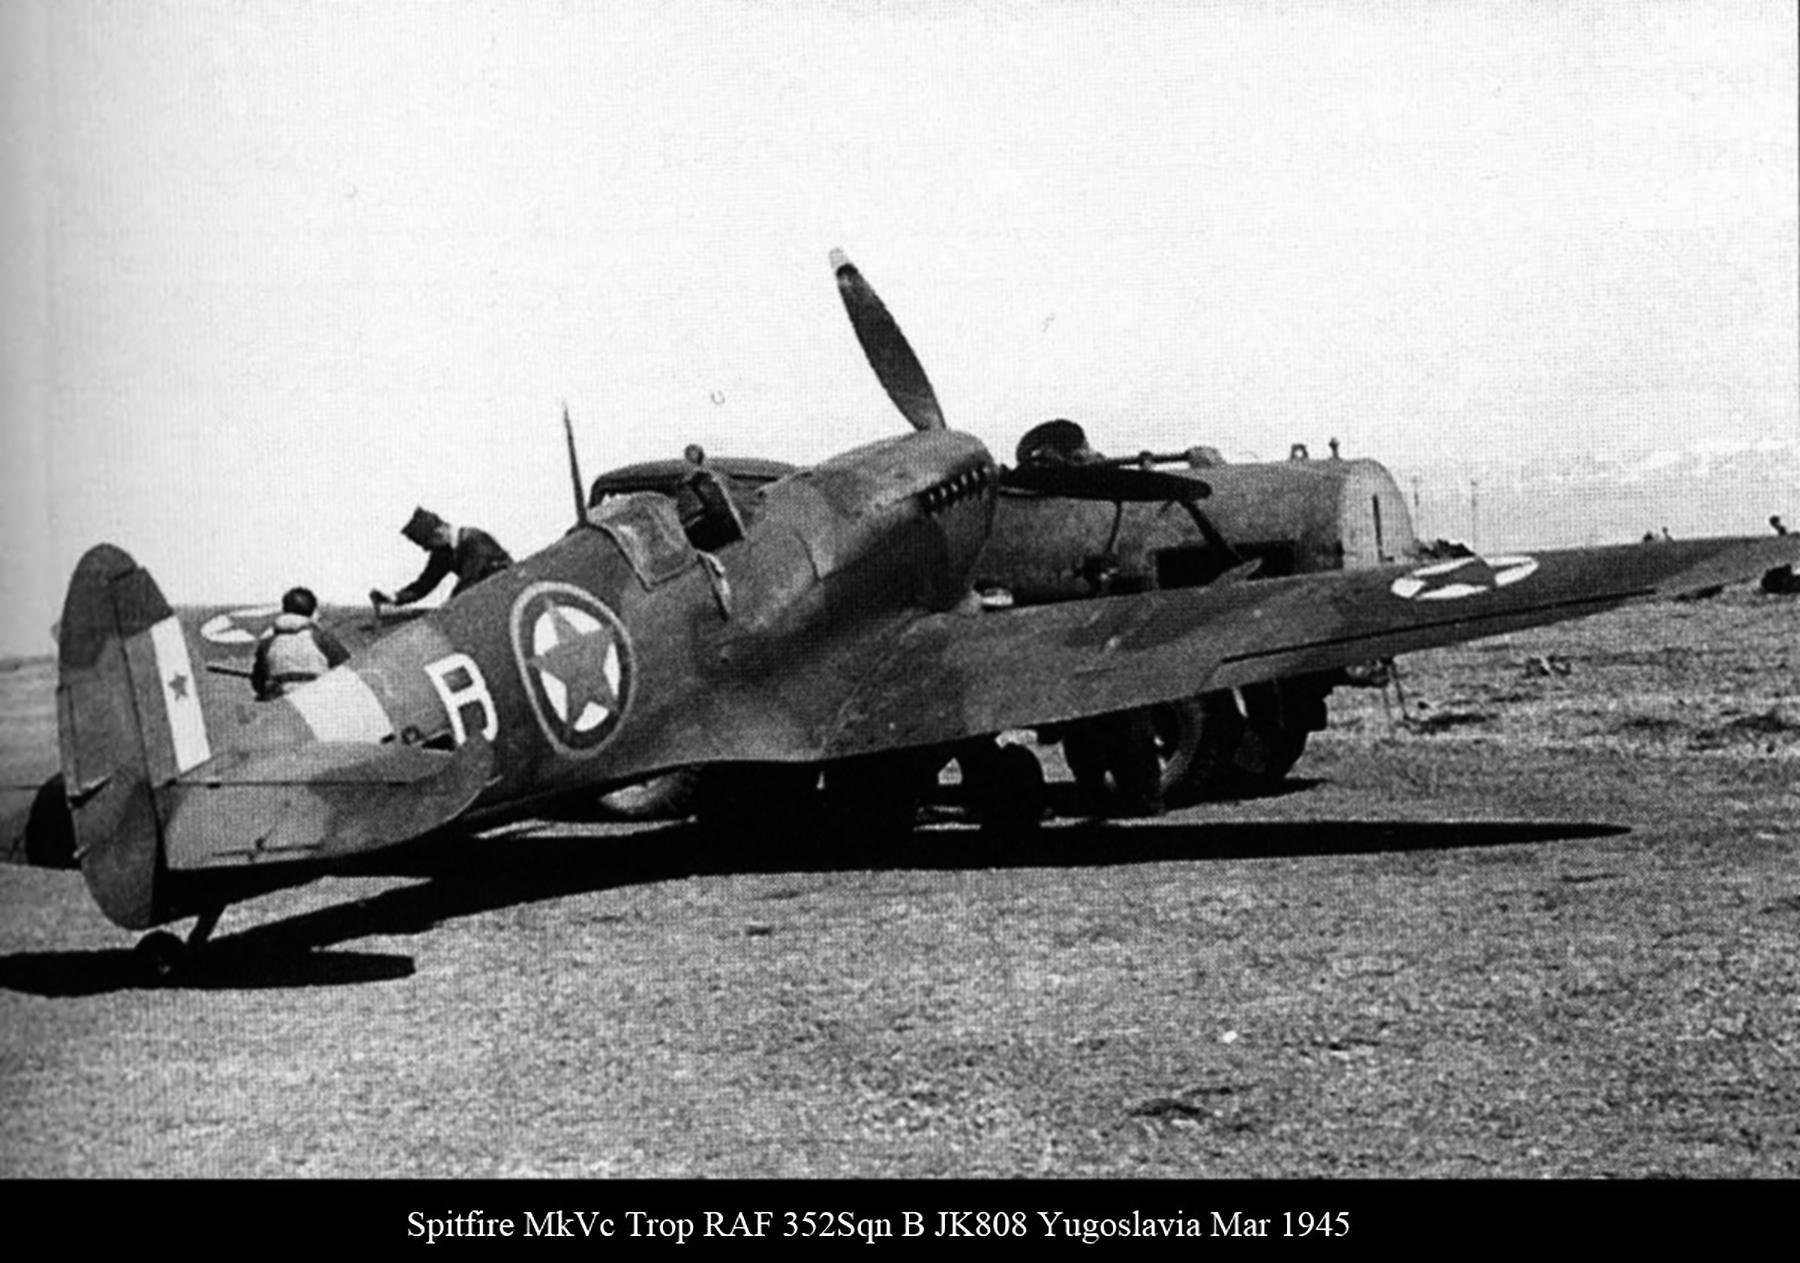 Spitfire MkVcTrop RAF 352Sqn B JK808 Yugoslavia Mar 1945 01